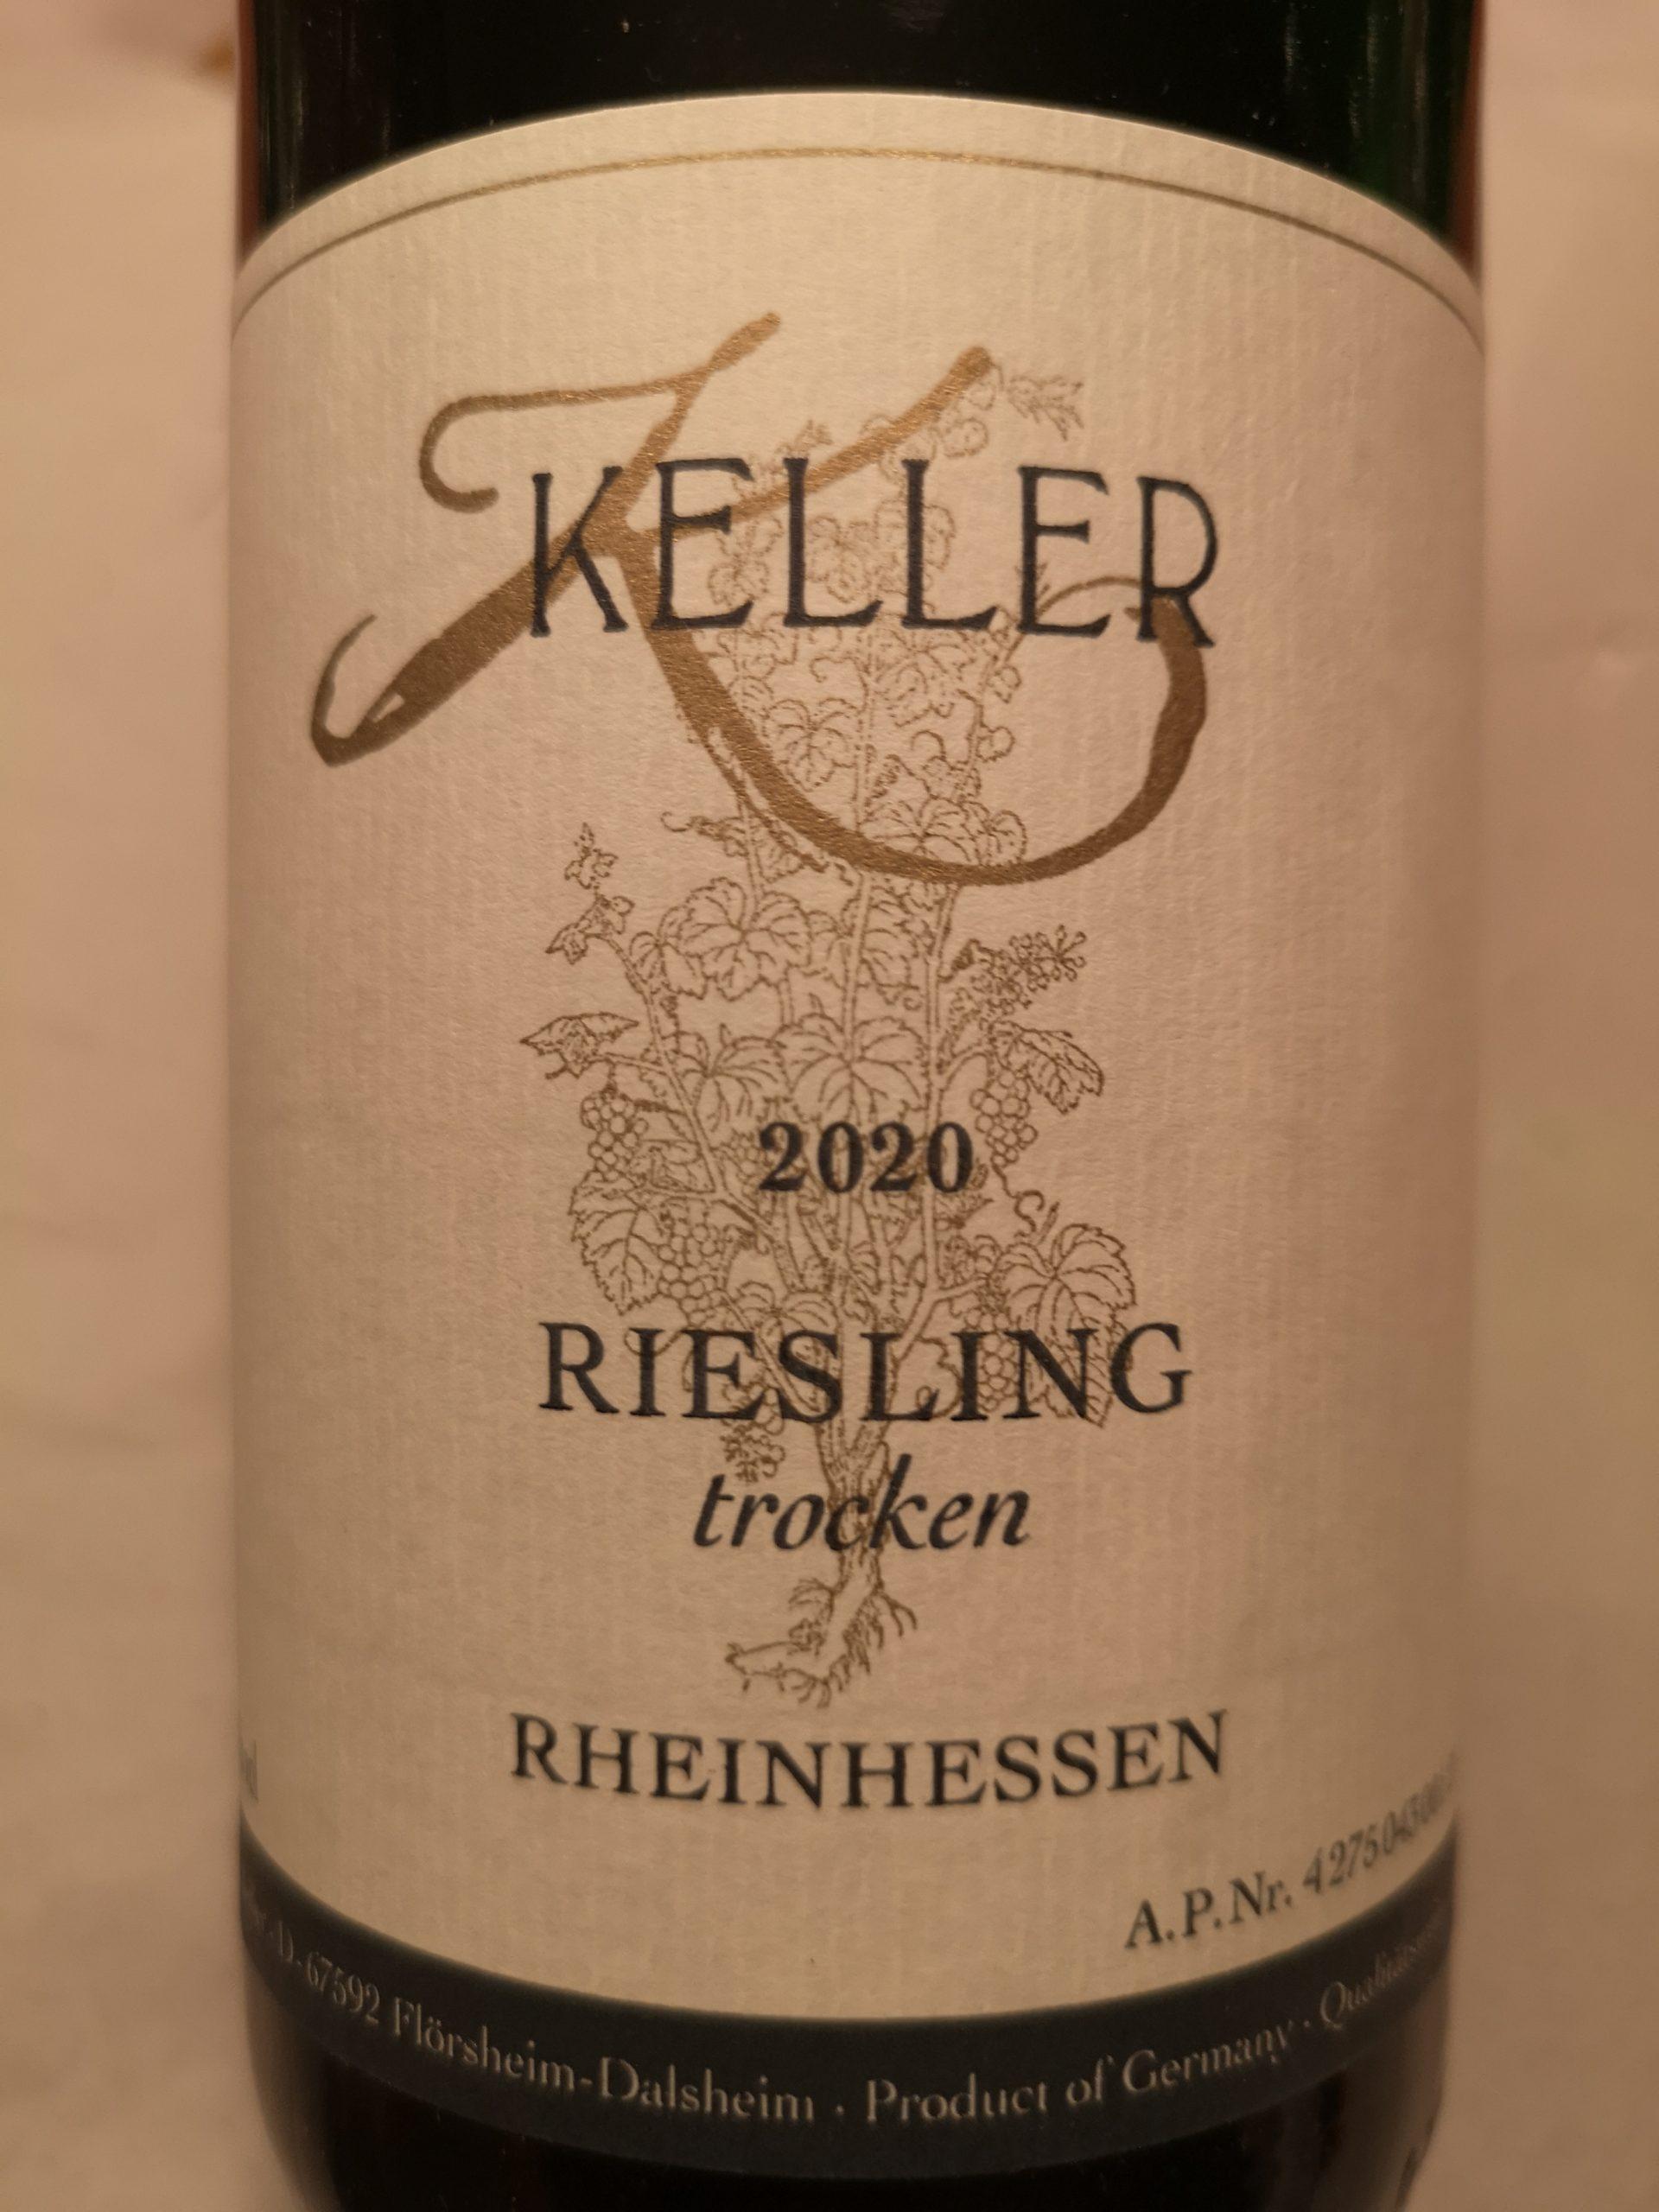 2020 Riesling trocken | Keller